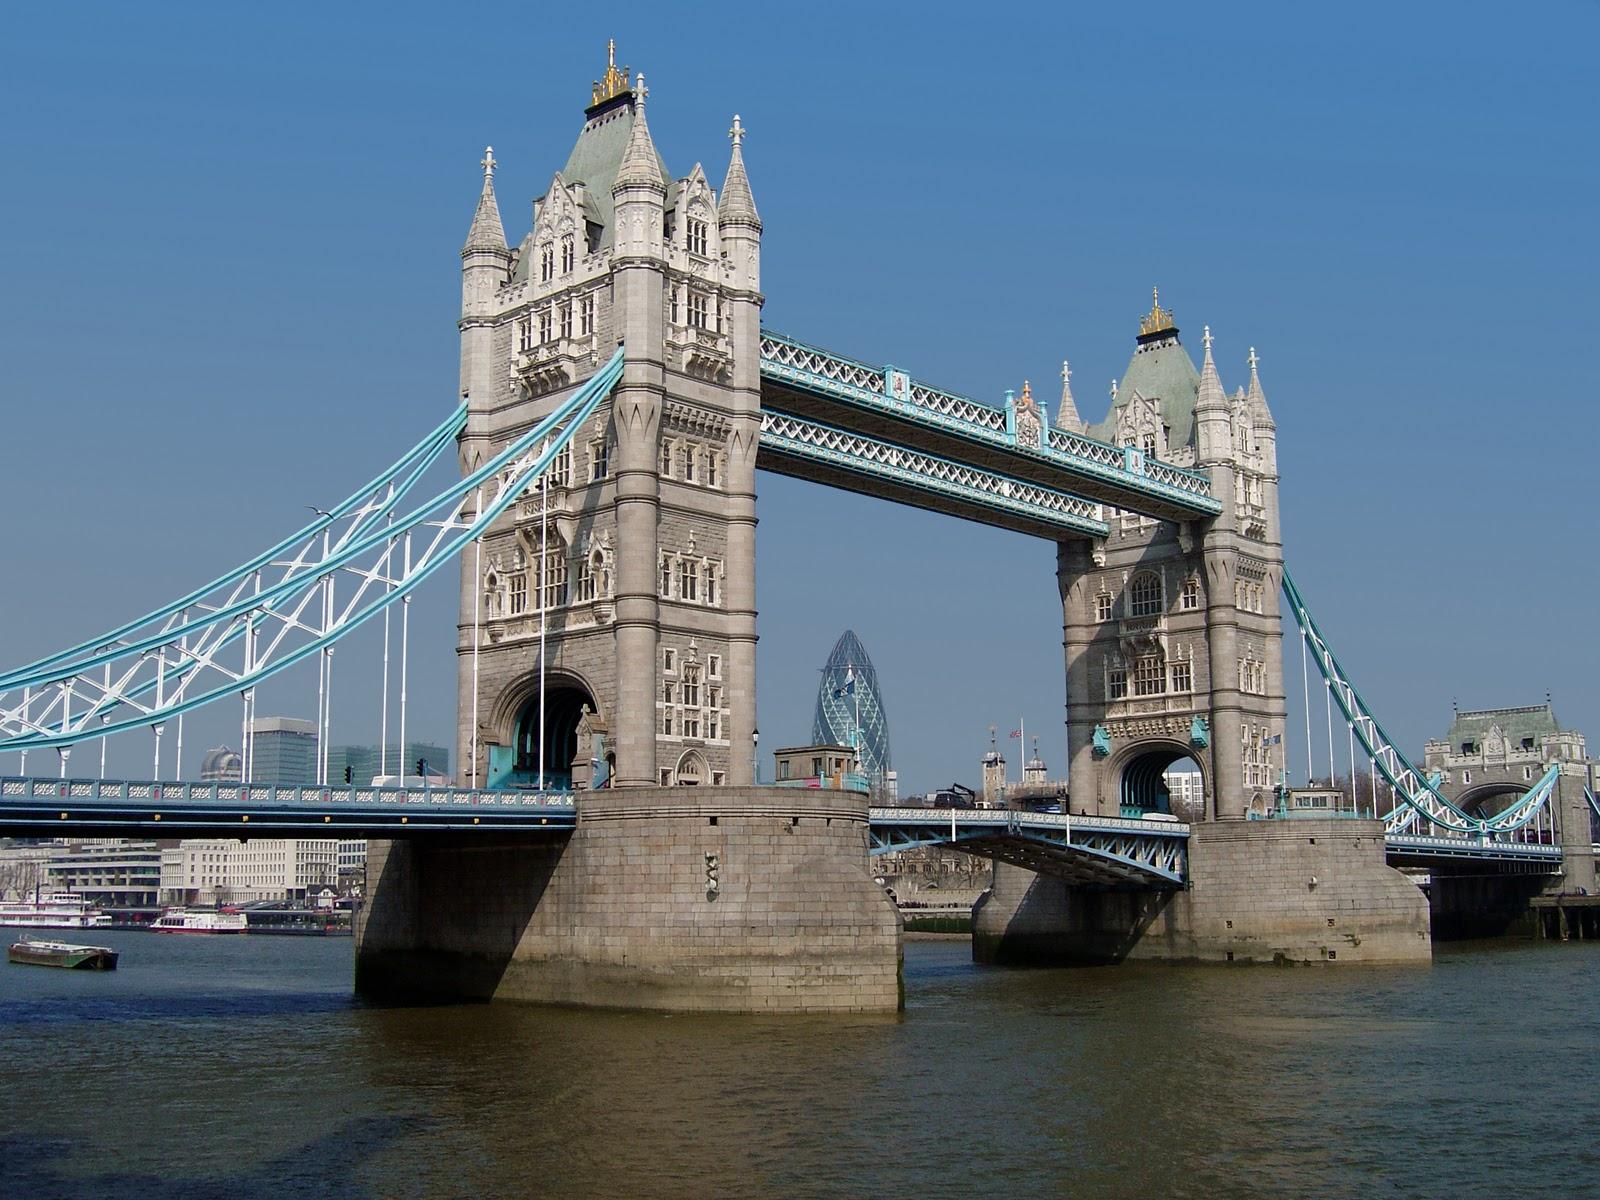 london high resolution - photo #45